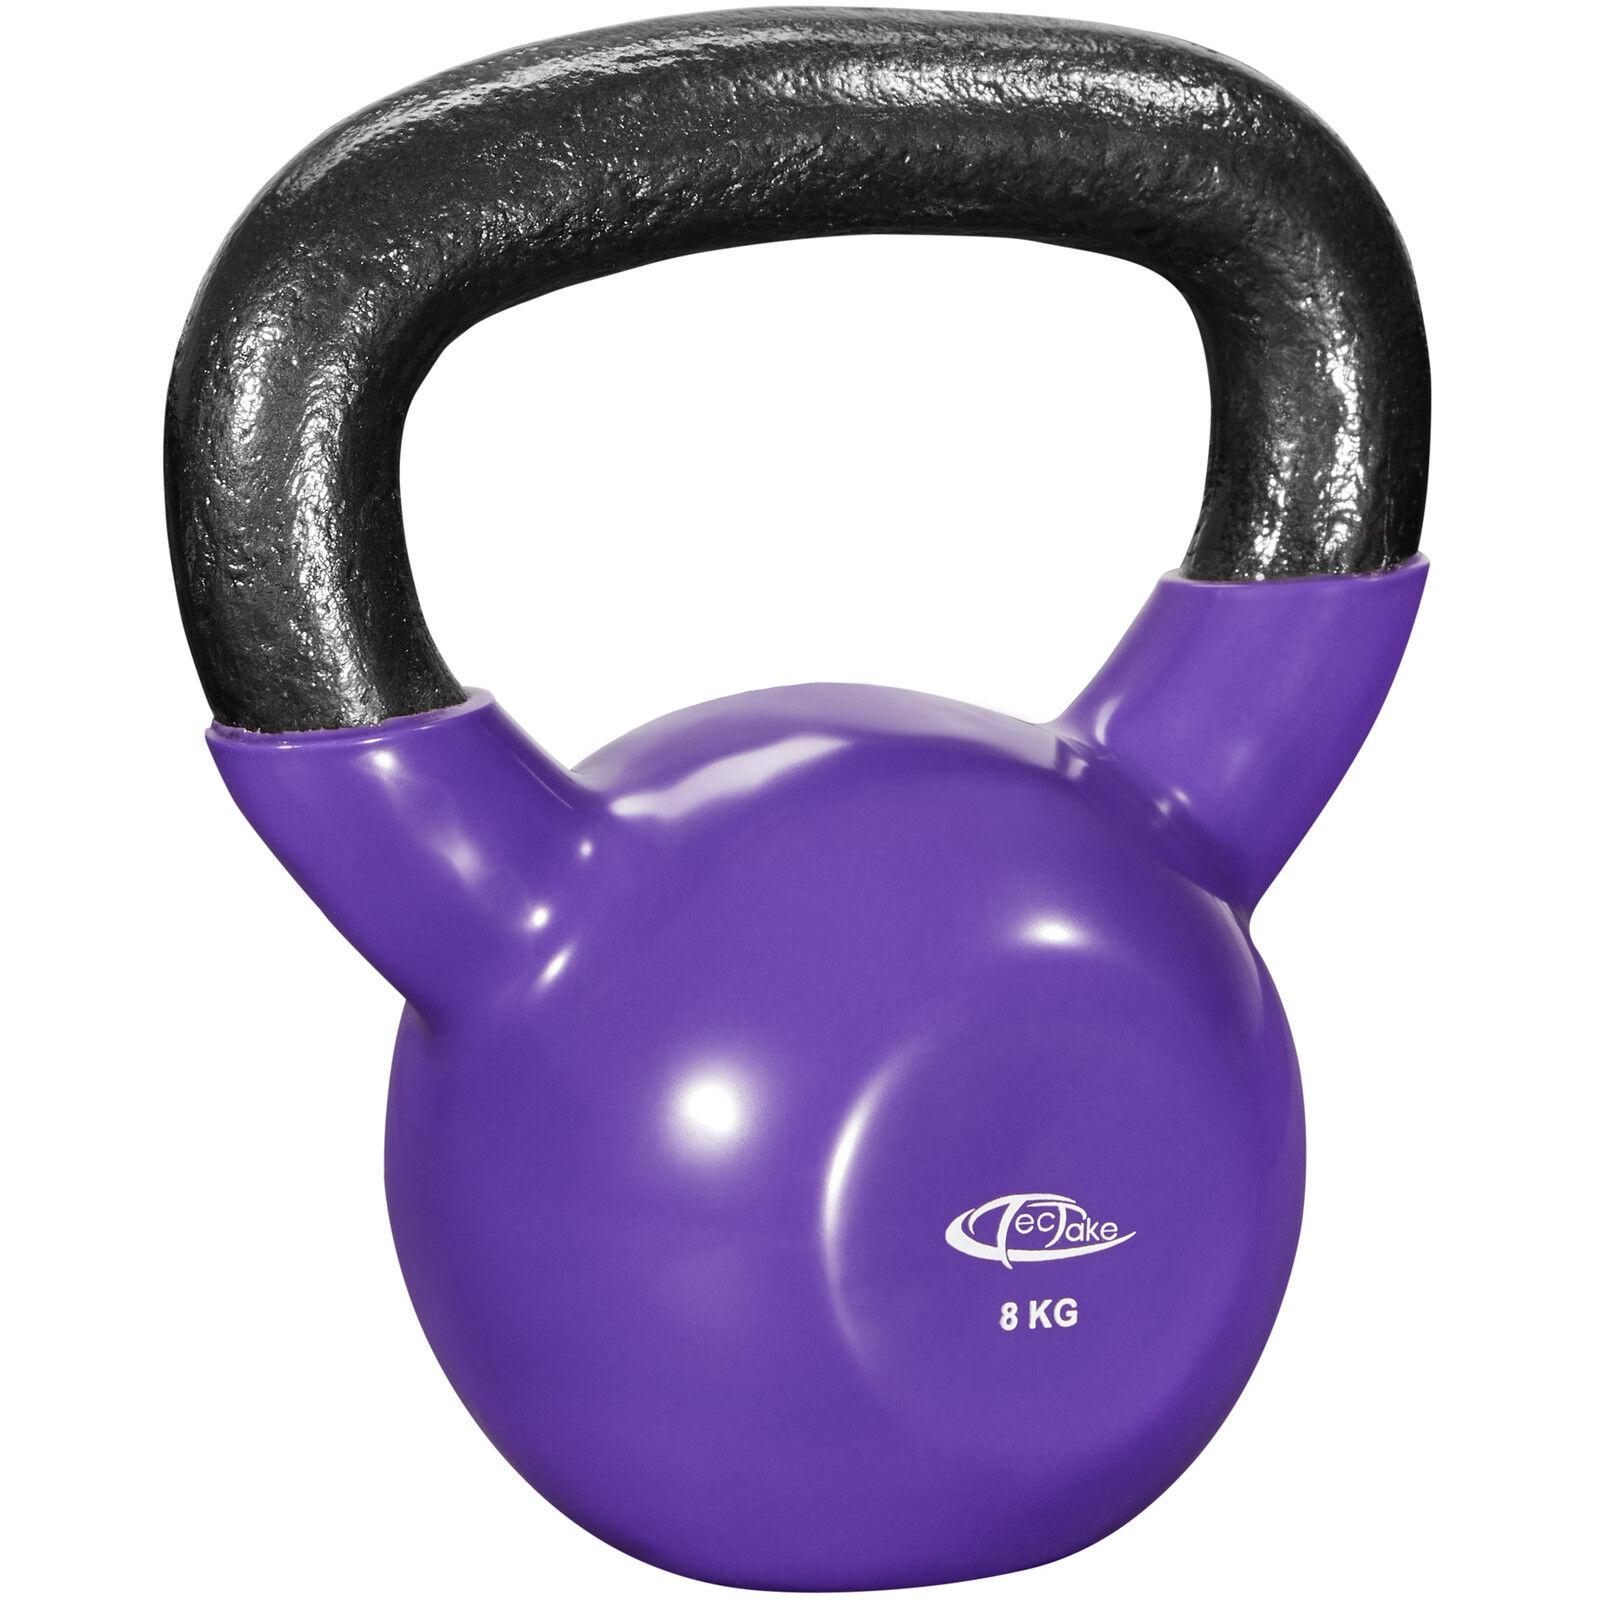 Kettlebells en fonte vinyle 2 kg à 24 24 à kg musculstion fitness haltères kettlebell 1b8b18